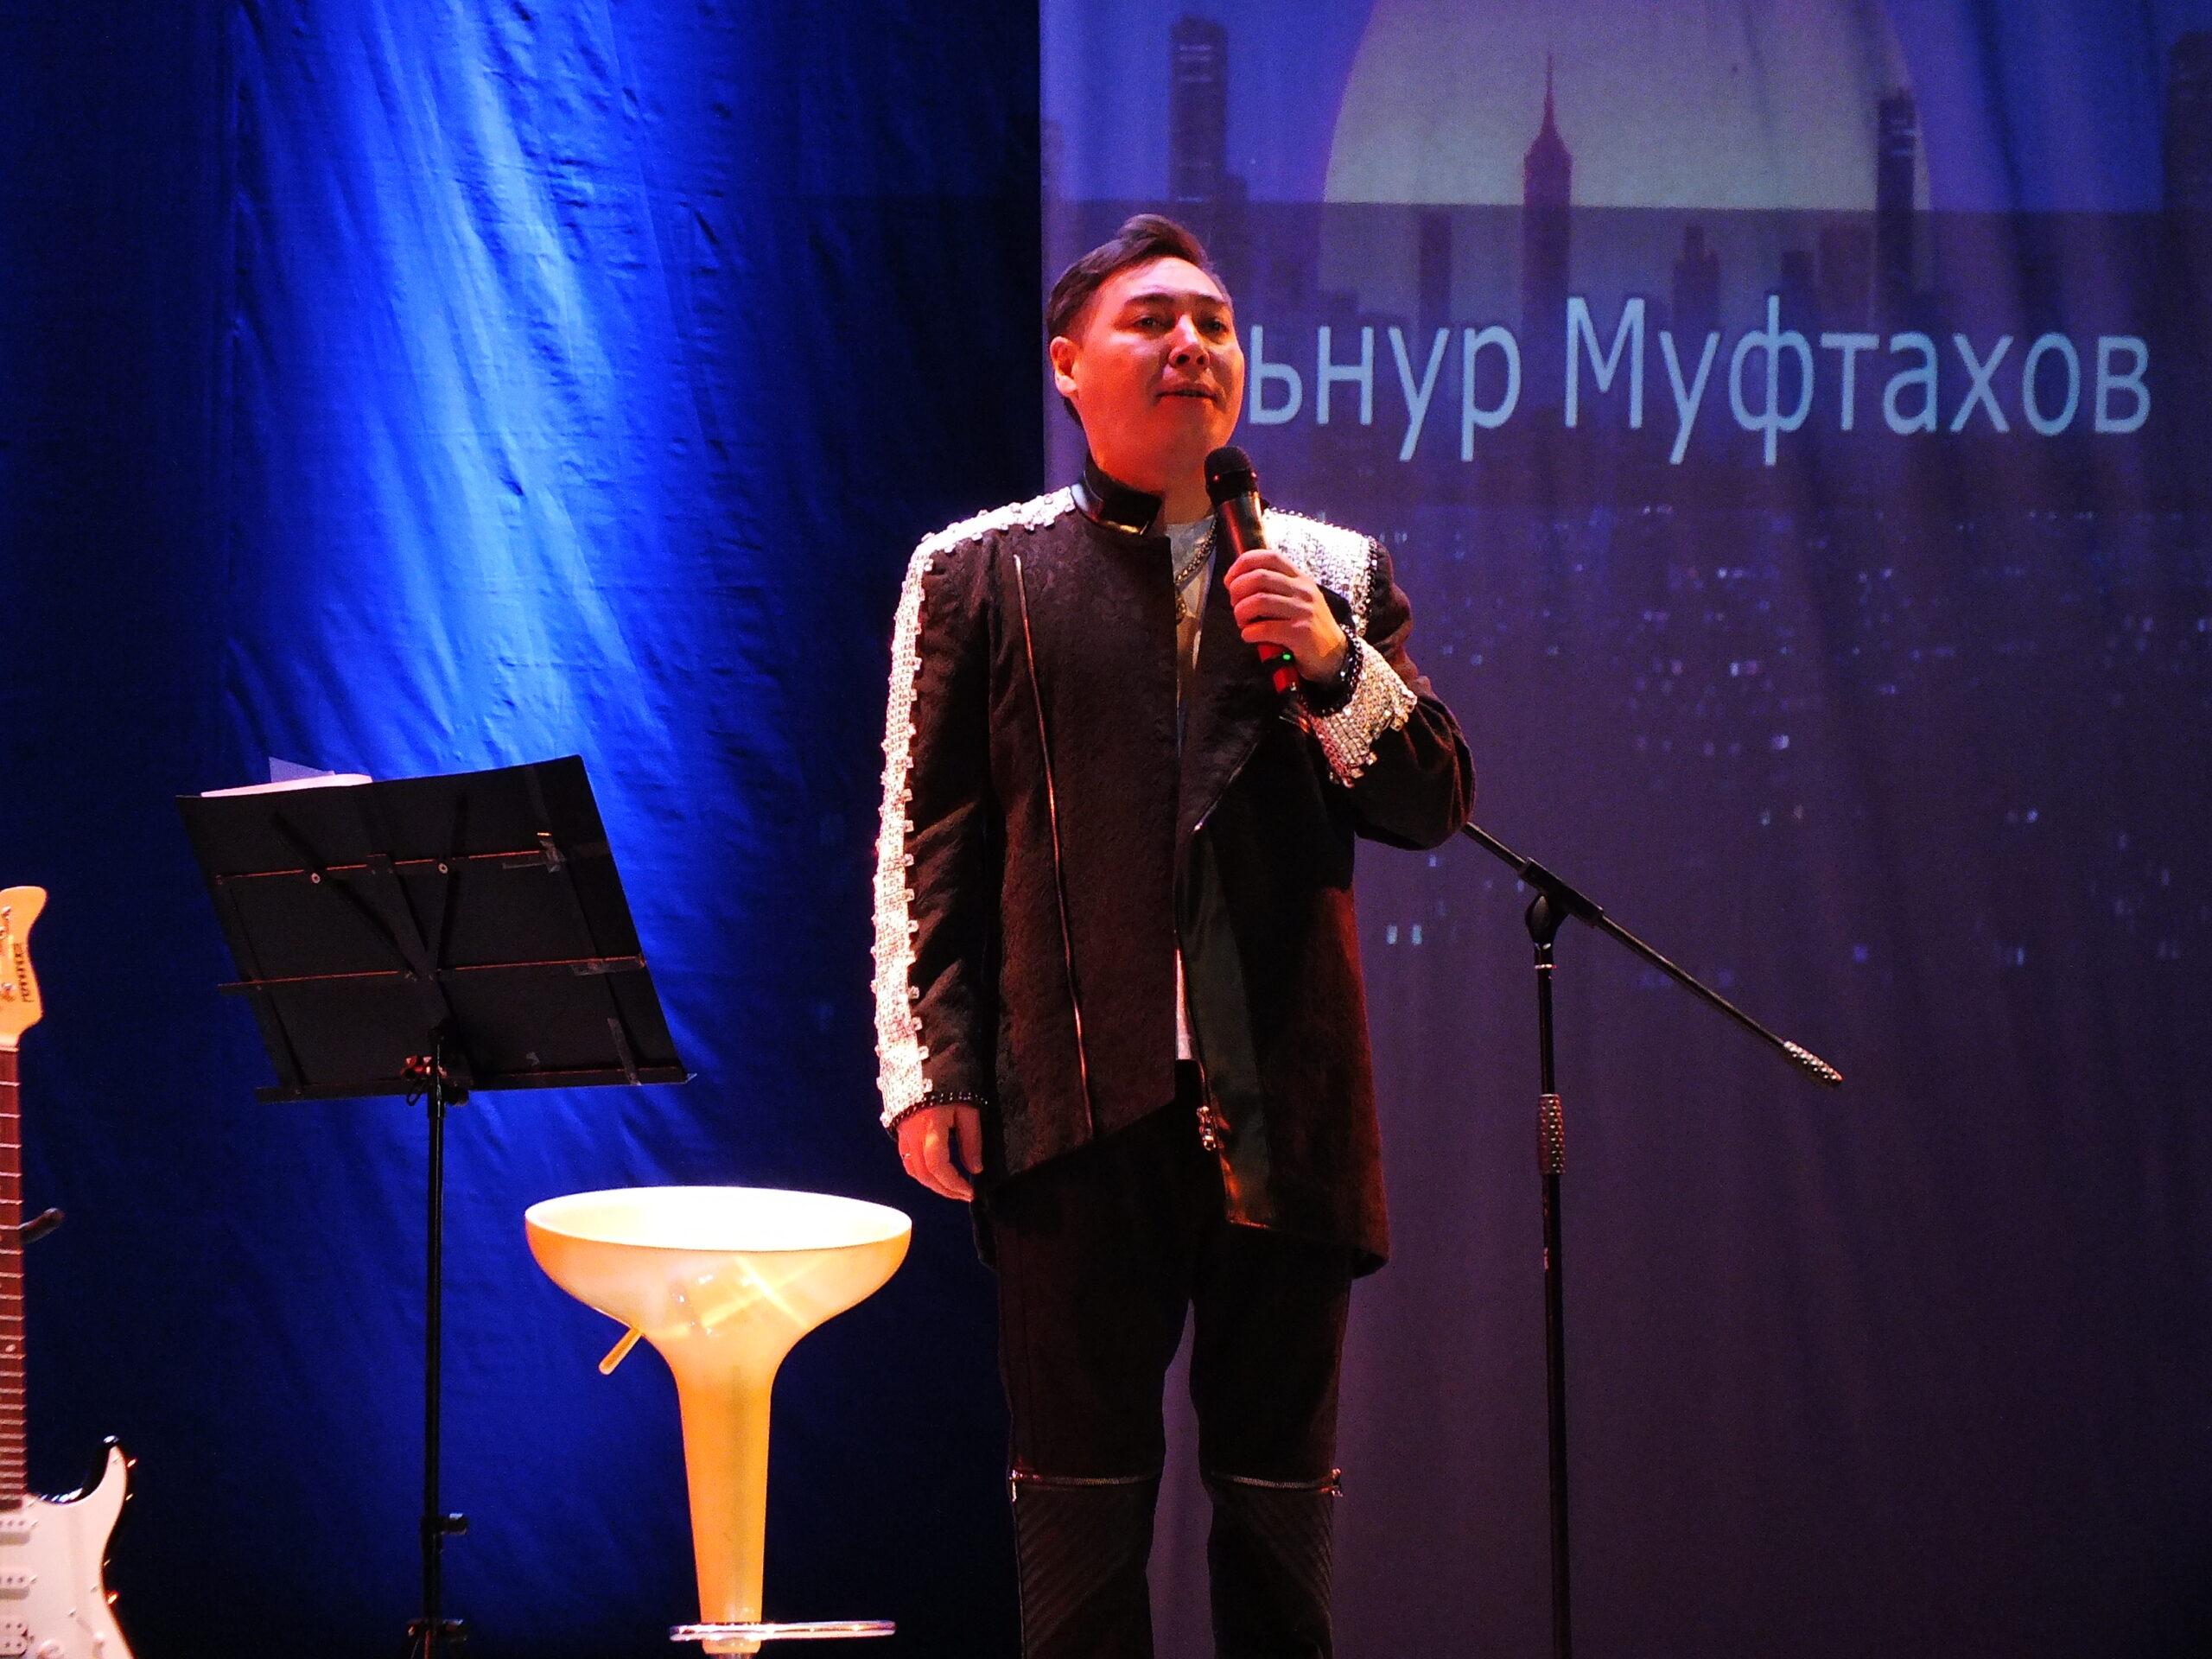 Концерт Ильнура Муфтахова «Ҡала егете».